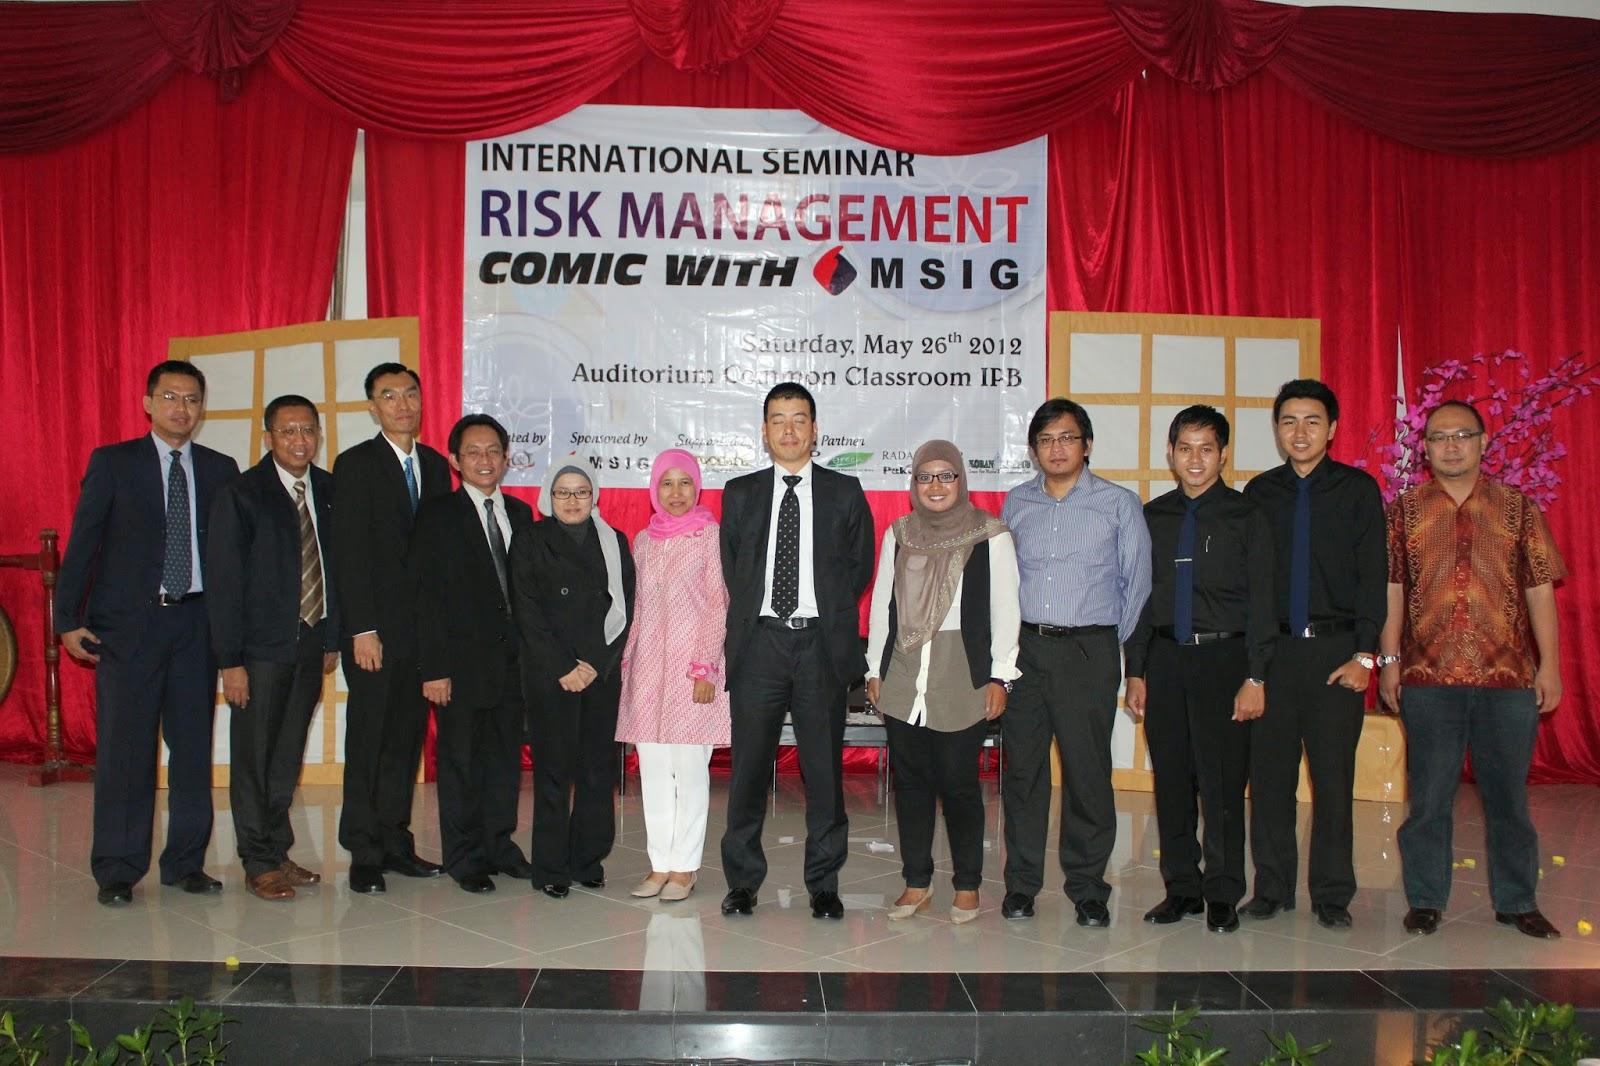 Lowongan Kerja PT. Asuransi MSIG Indonesia Bulan Mei 2014